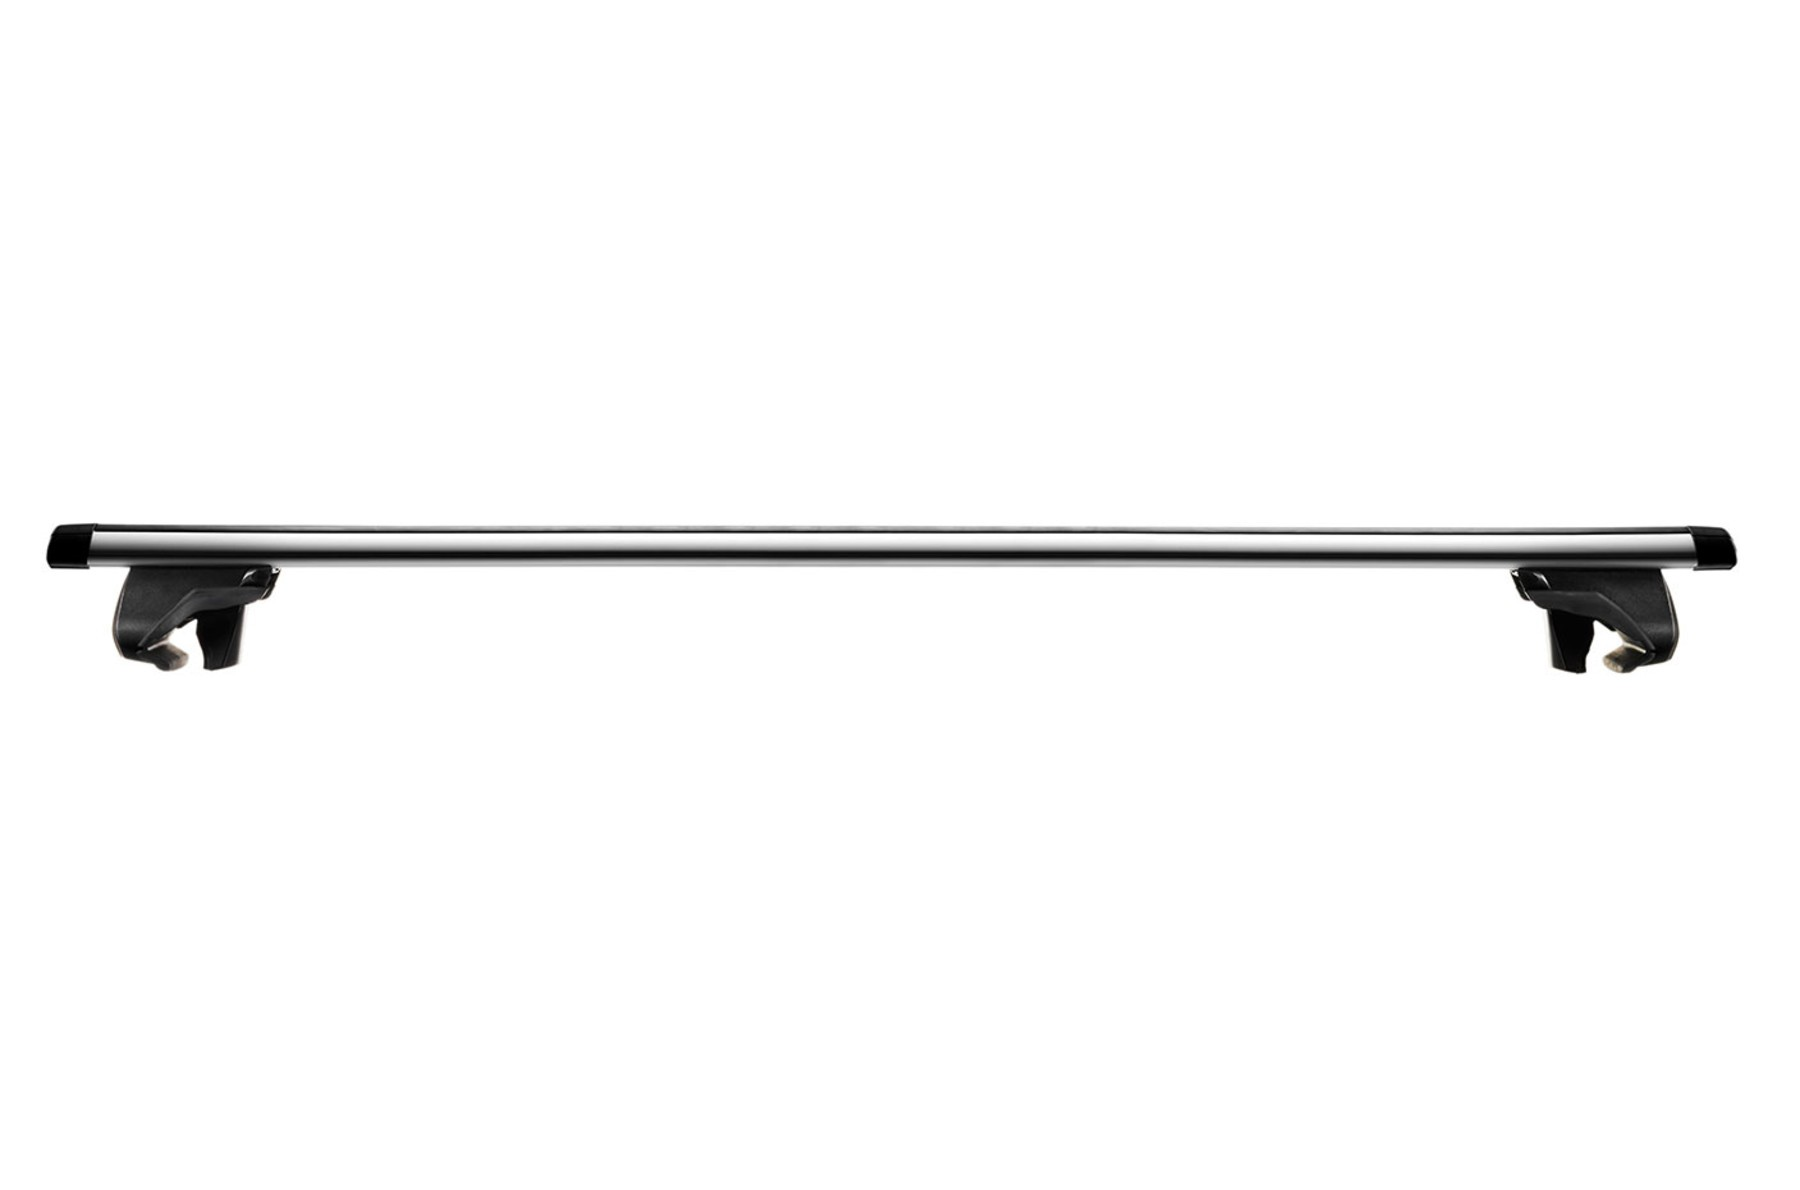 Rack Completo Thule Smart AeroBar 127cm Longarina (795)